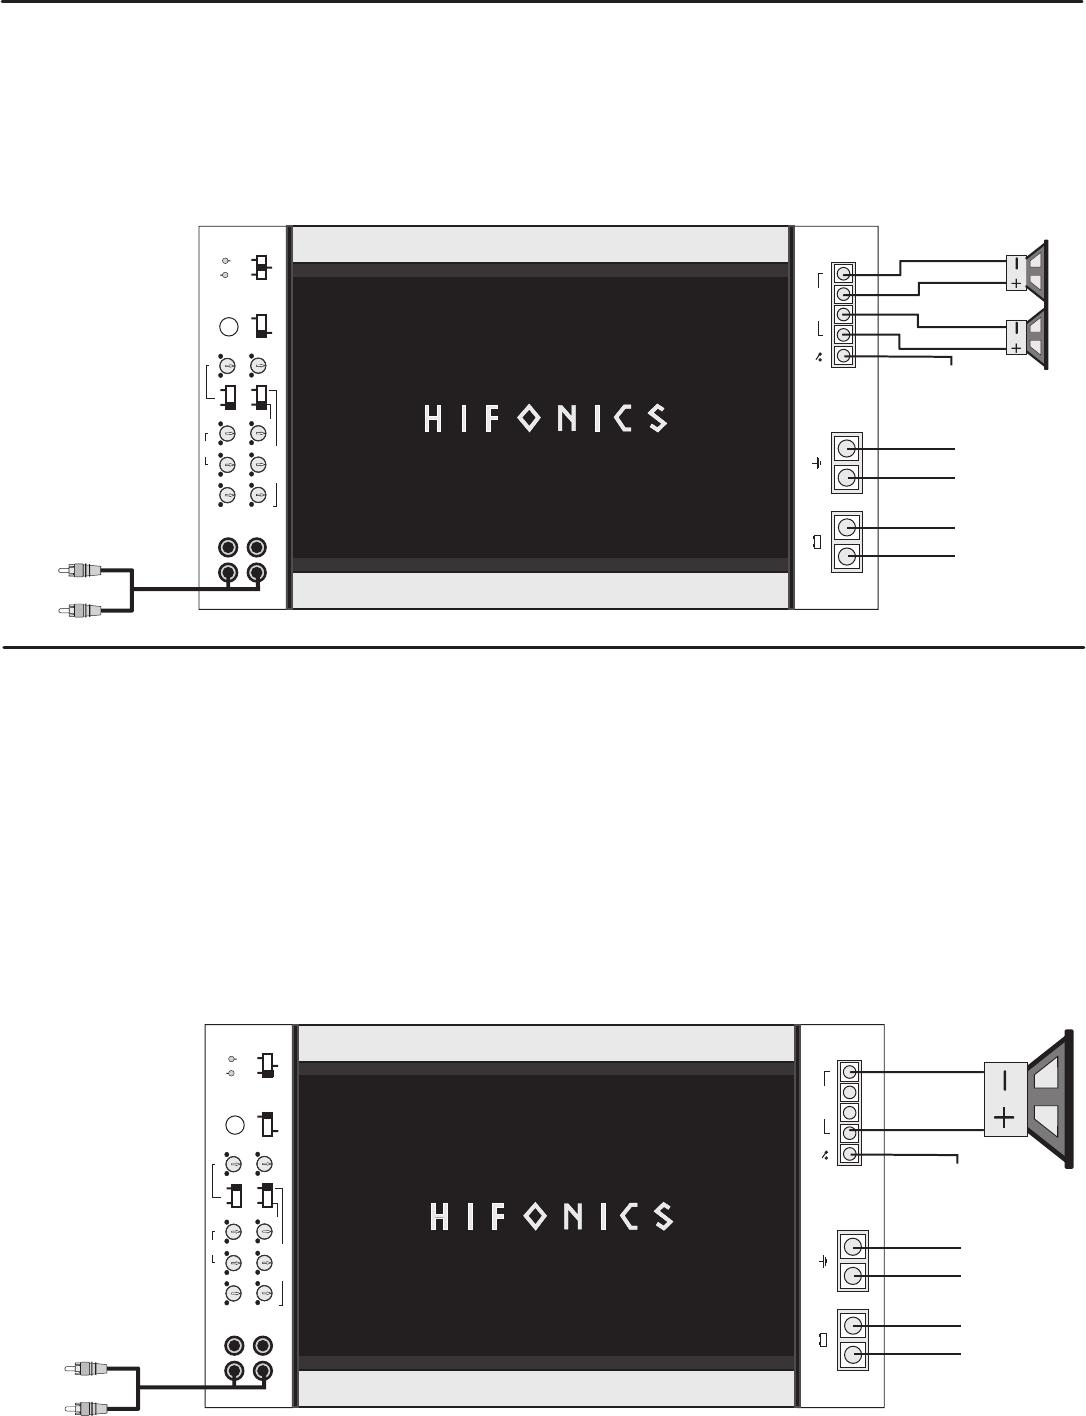 Handleiding Hifonics Mt Olympus Pagina 4 Van 17 English Amp Wiring Diagram 3